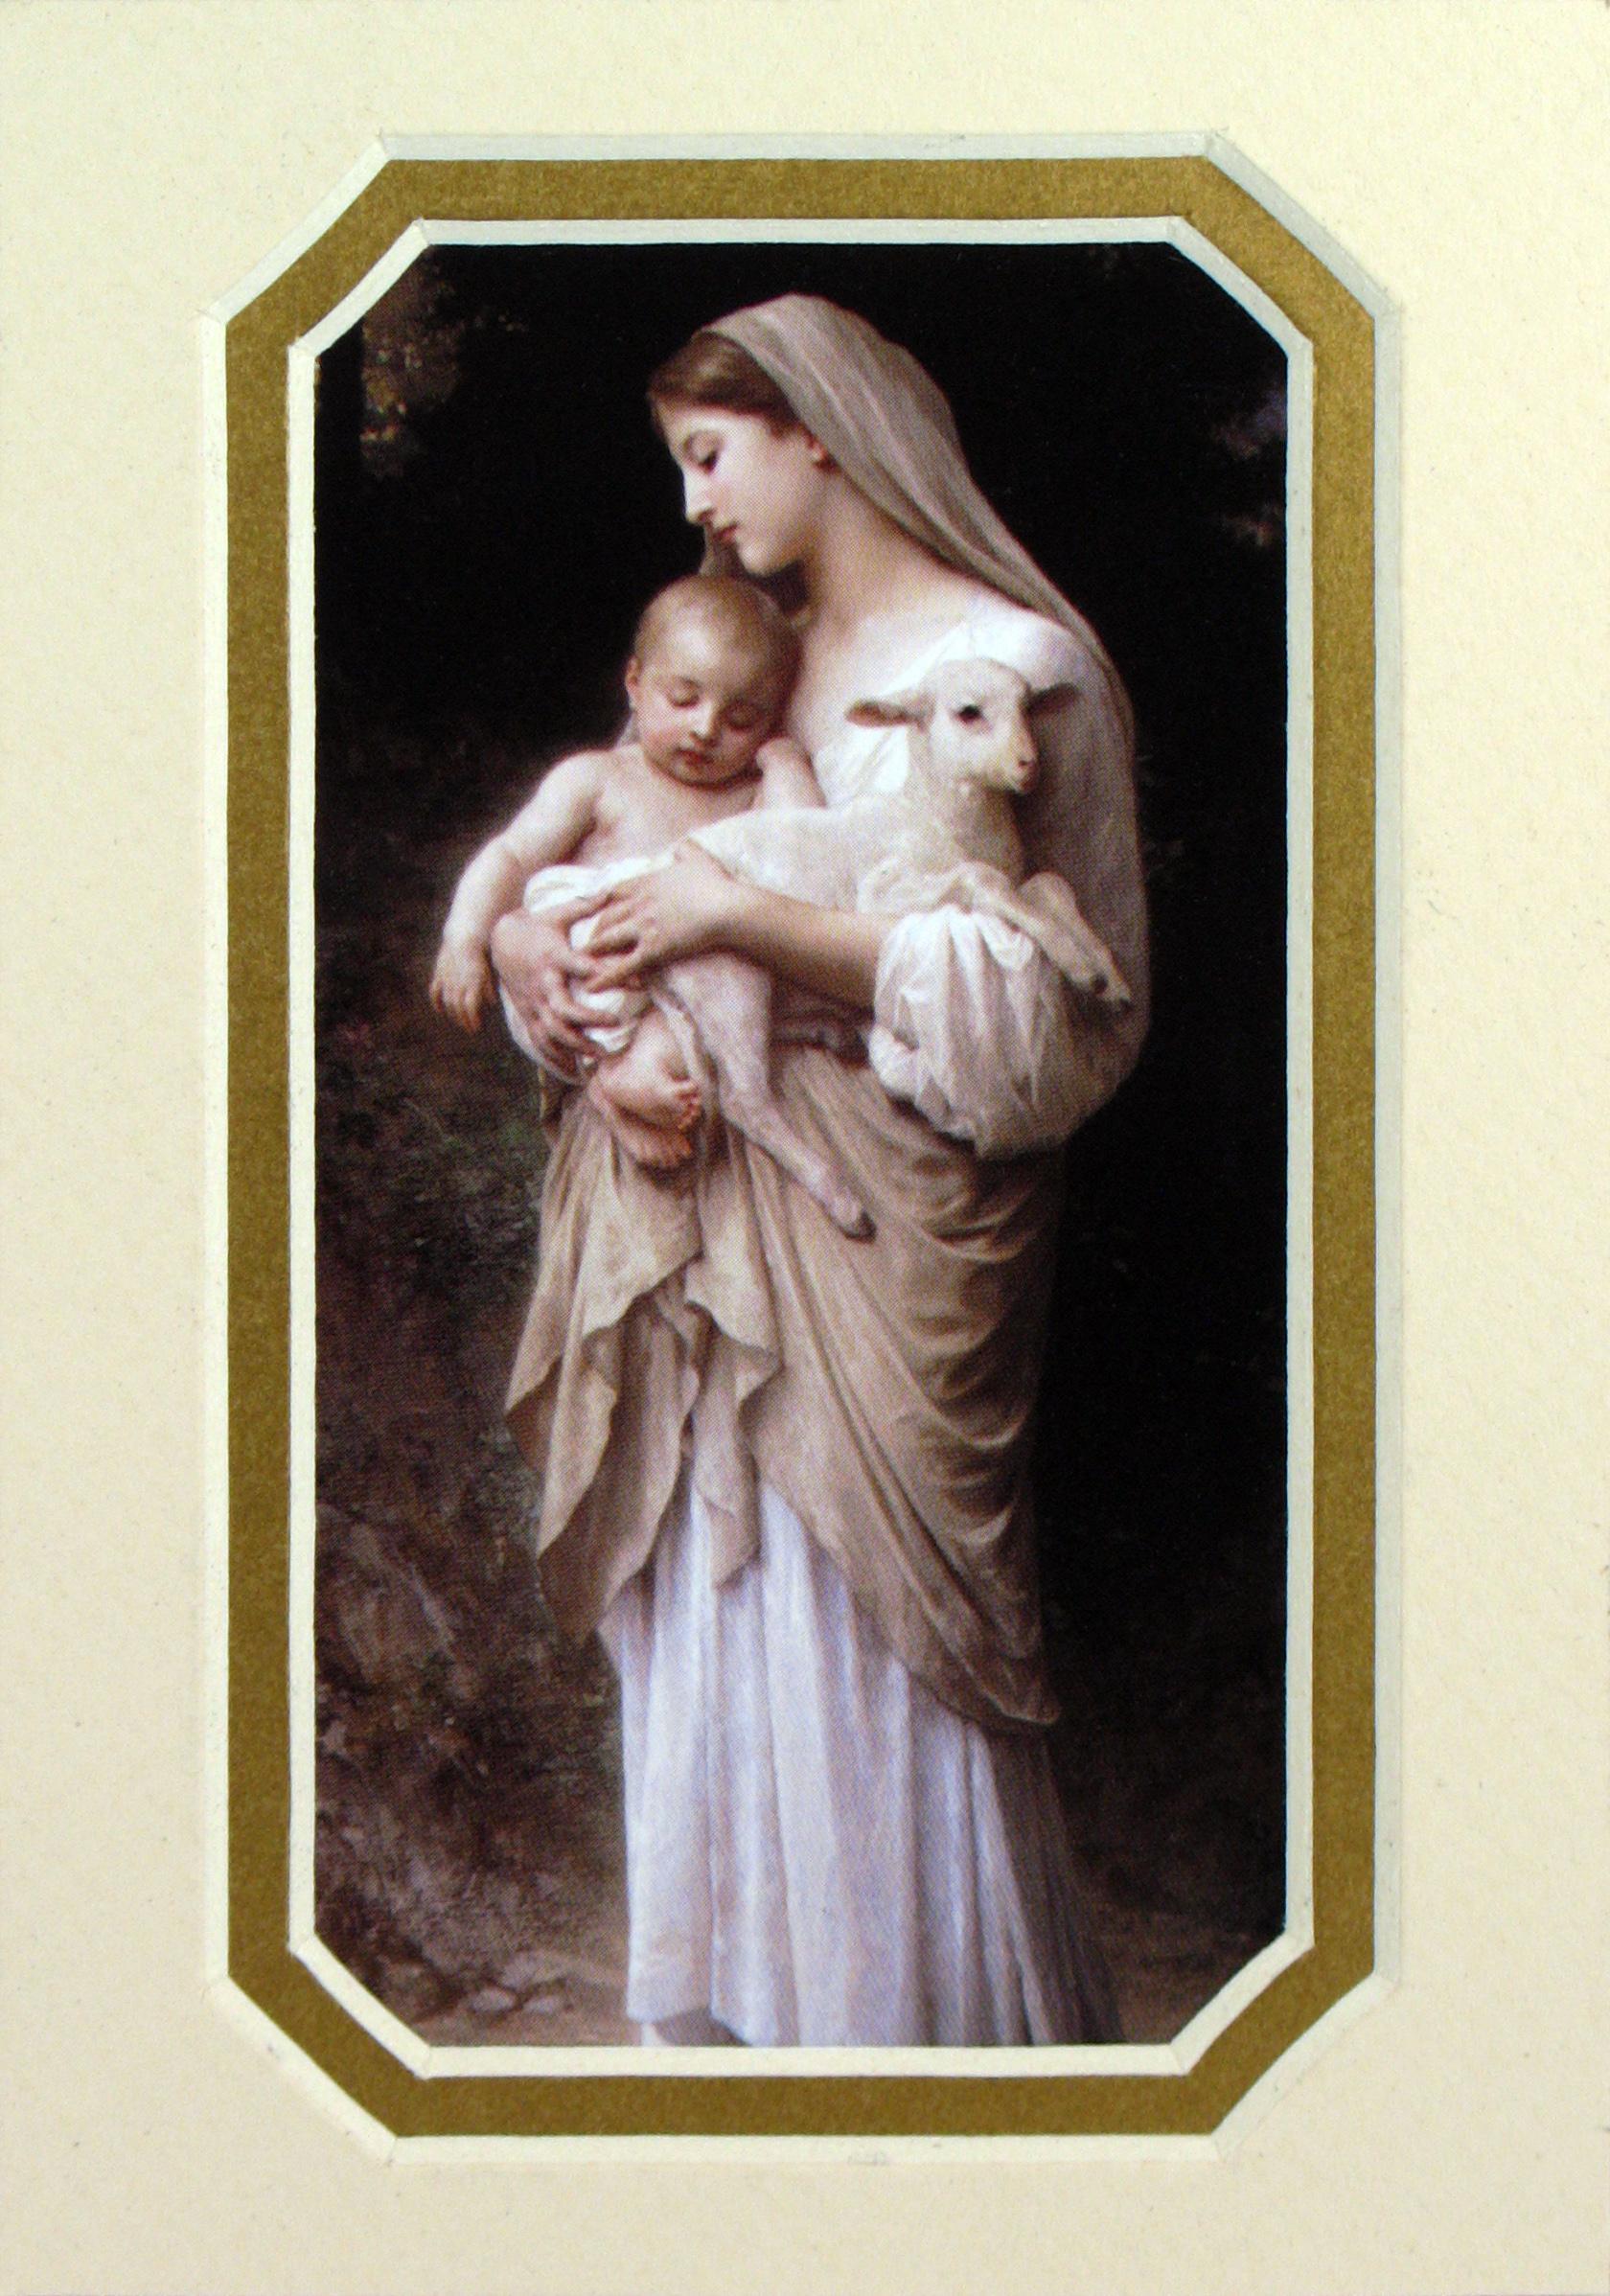 L'Innocence 3x5 Prayerful Mat #35MAT-IN